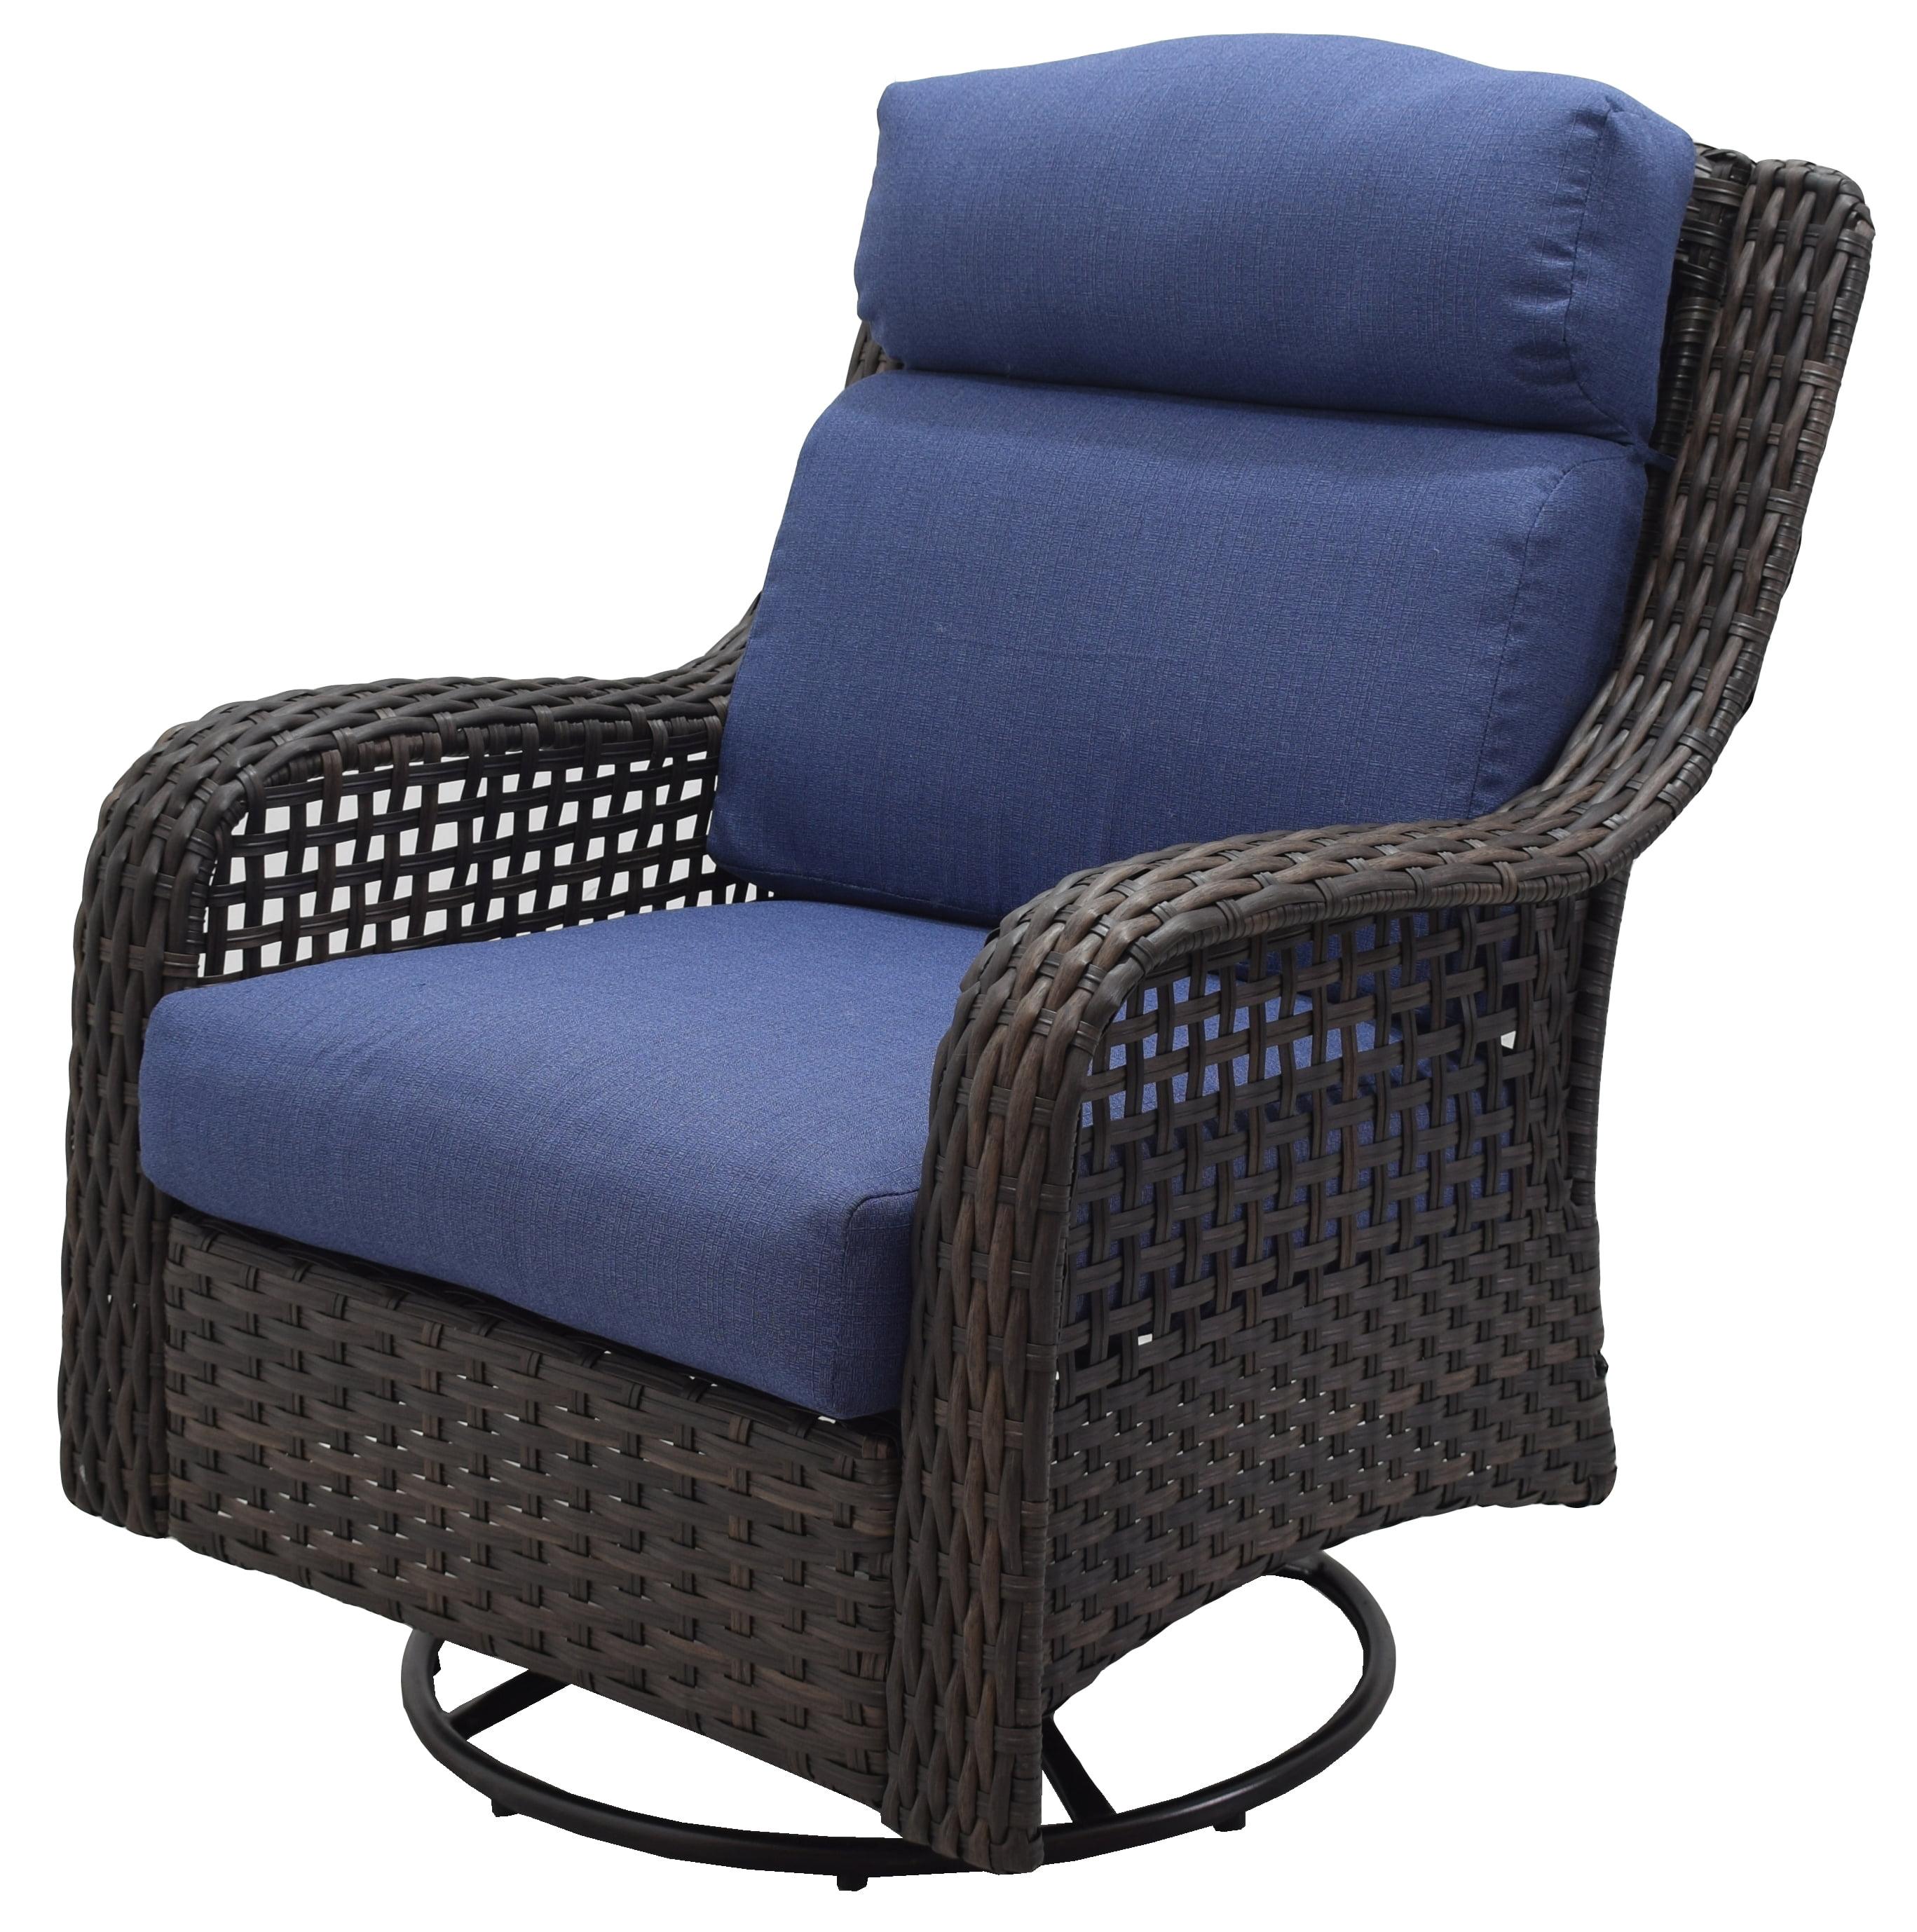 Better Homes Gardens Ravenbrooke 4 Piece Patio Conversation Set With Blue Cushions